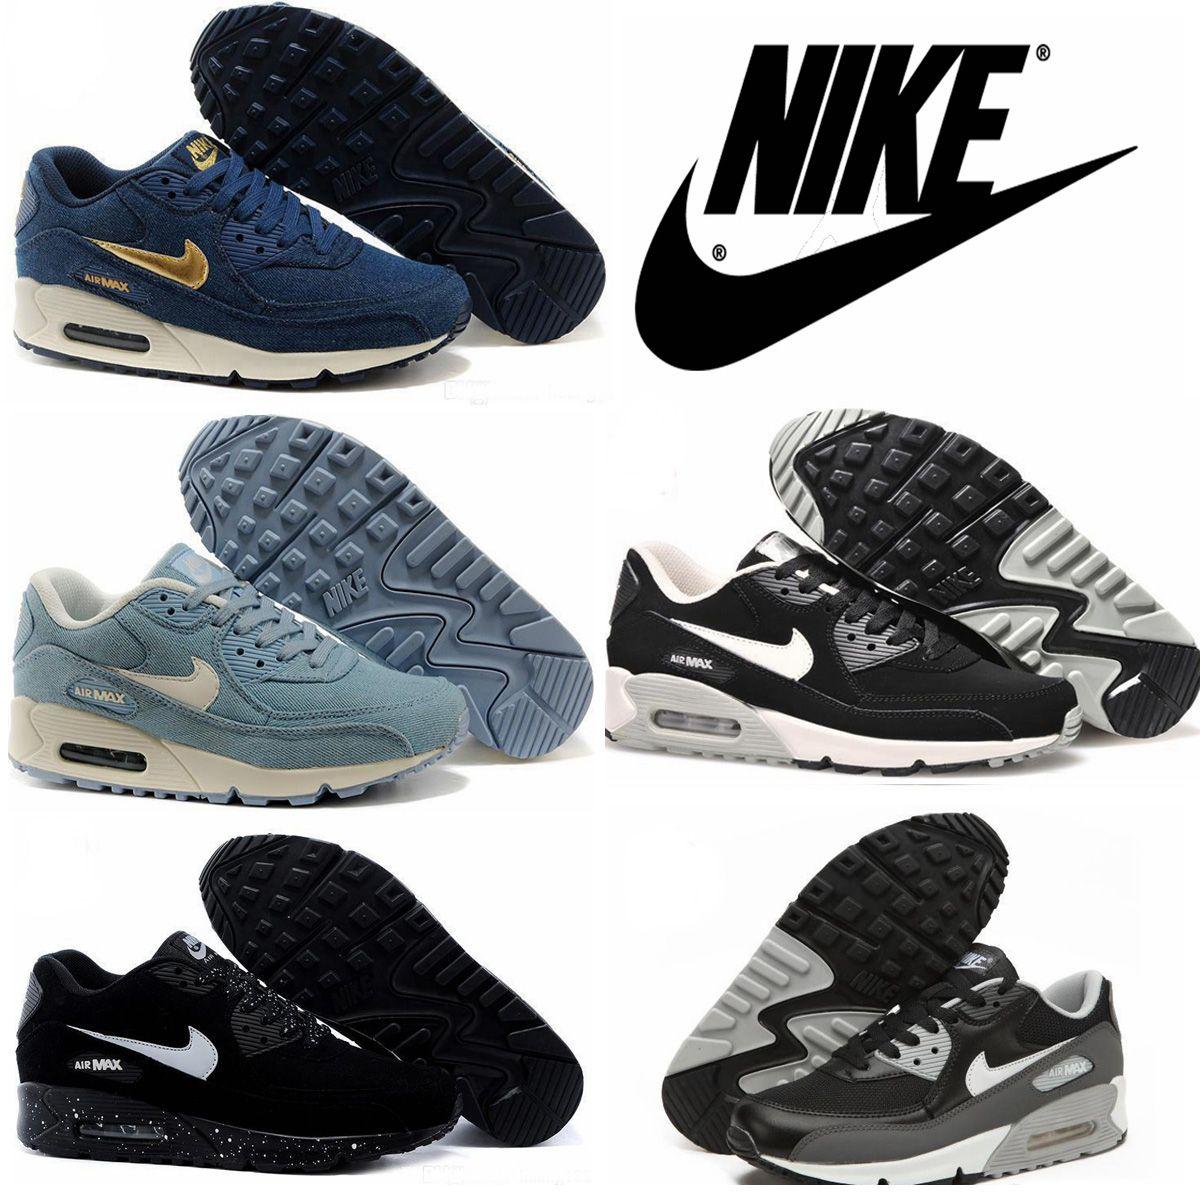 Nike Air Jordan Duffle Bag - Musée des impressionnismes Giverny 00d1f35ffe